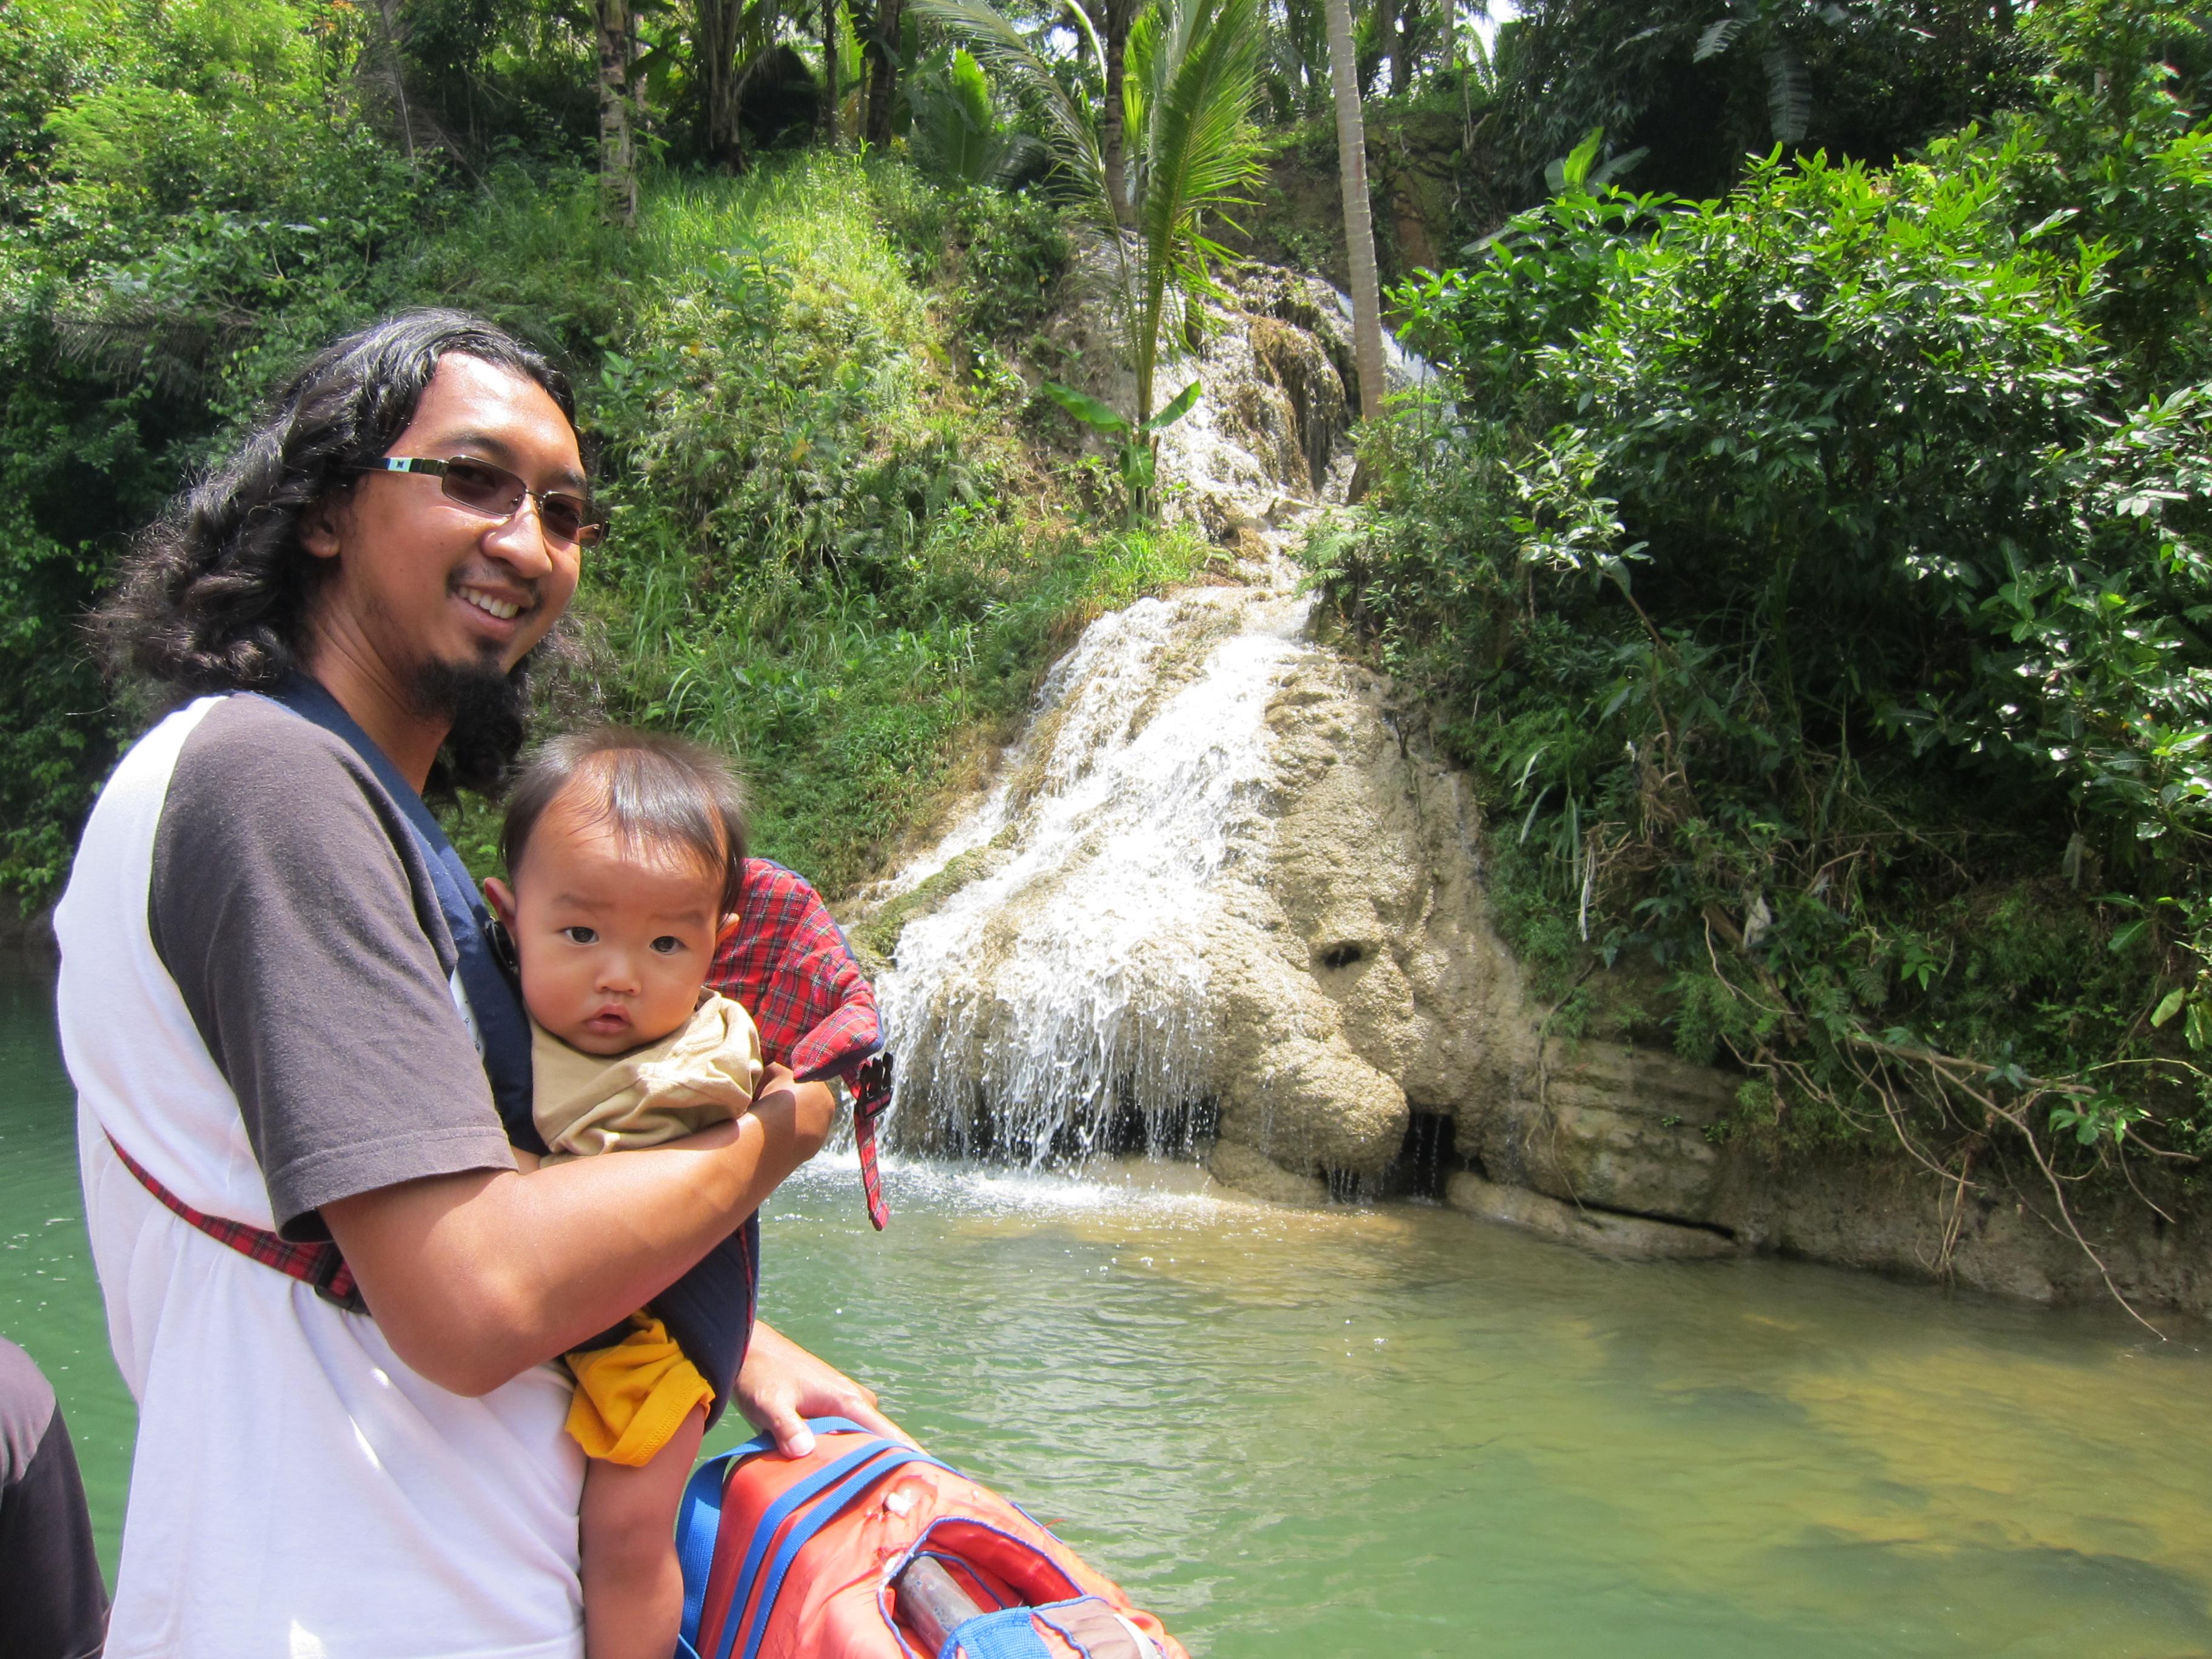 Caving Tubing Rafting Di Goa Pindul Dan Srigethuk Bersama Bayi Backpackology Me